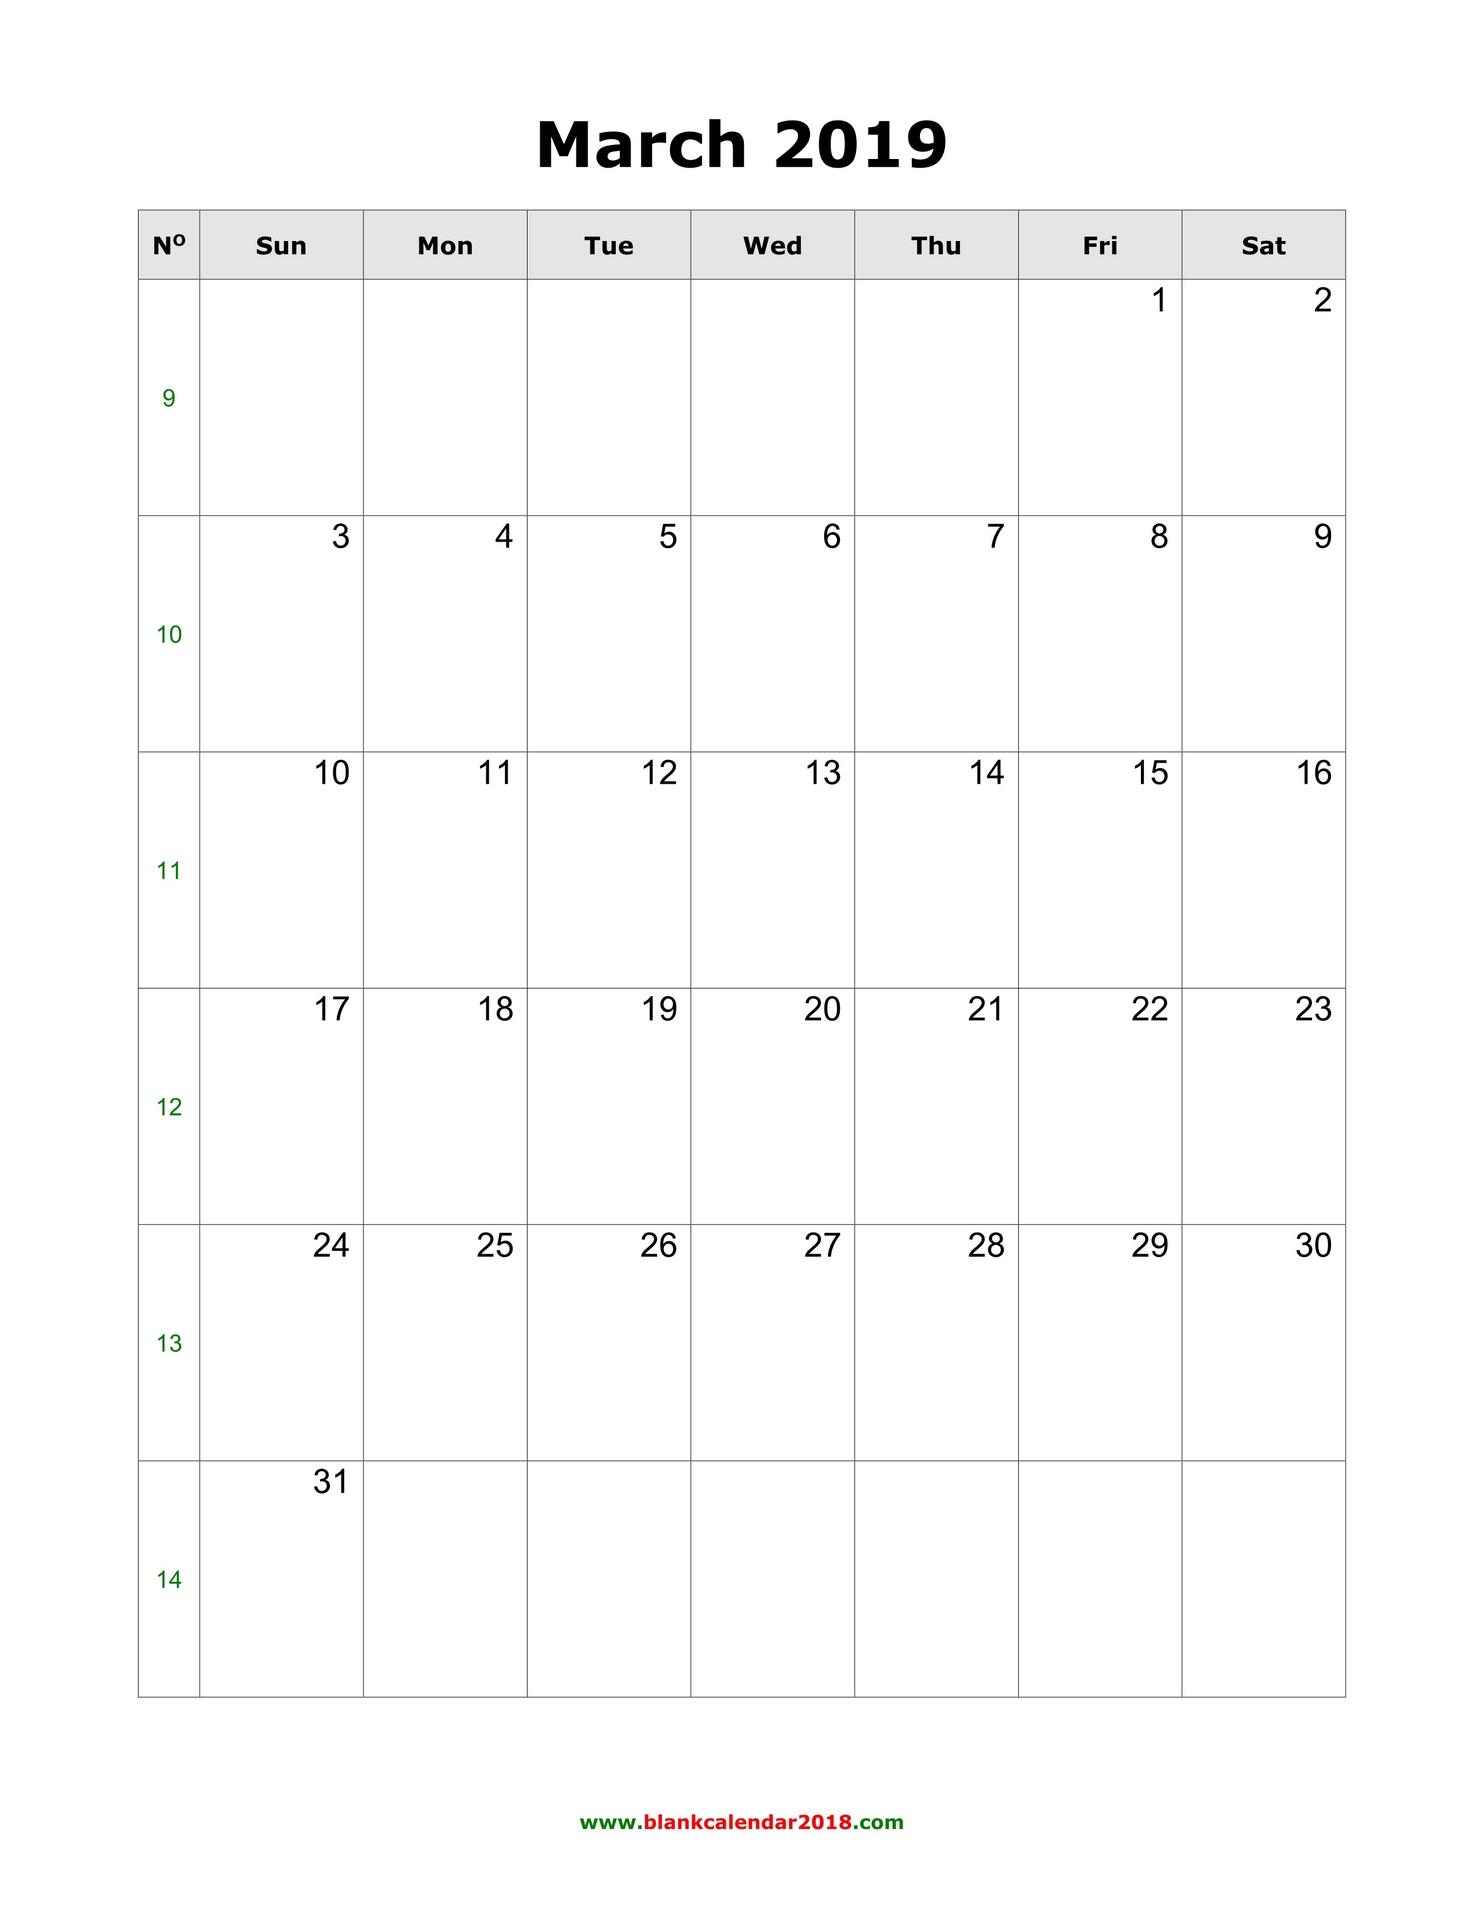 photo regarding Free Printable March Calendar named Blank Calendar for March 2019